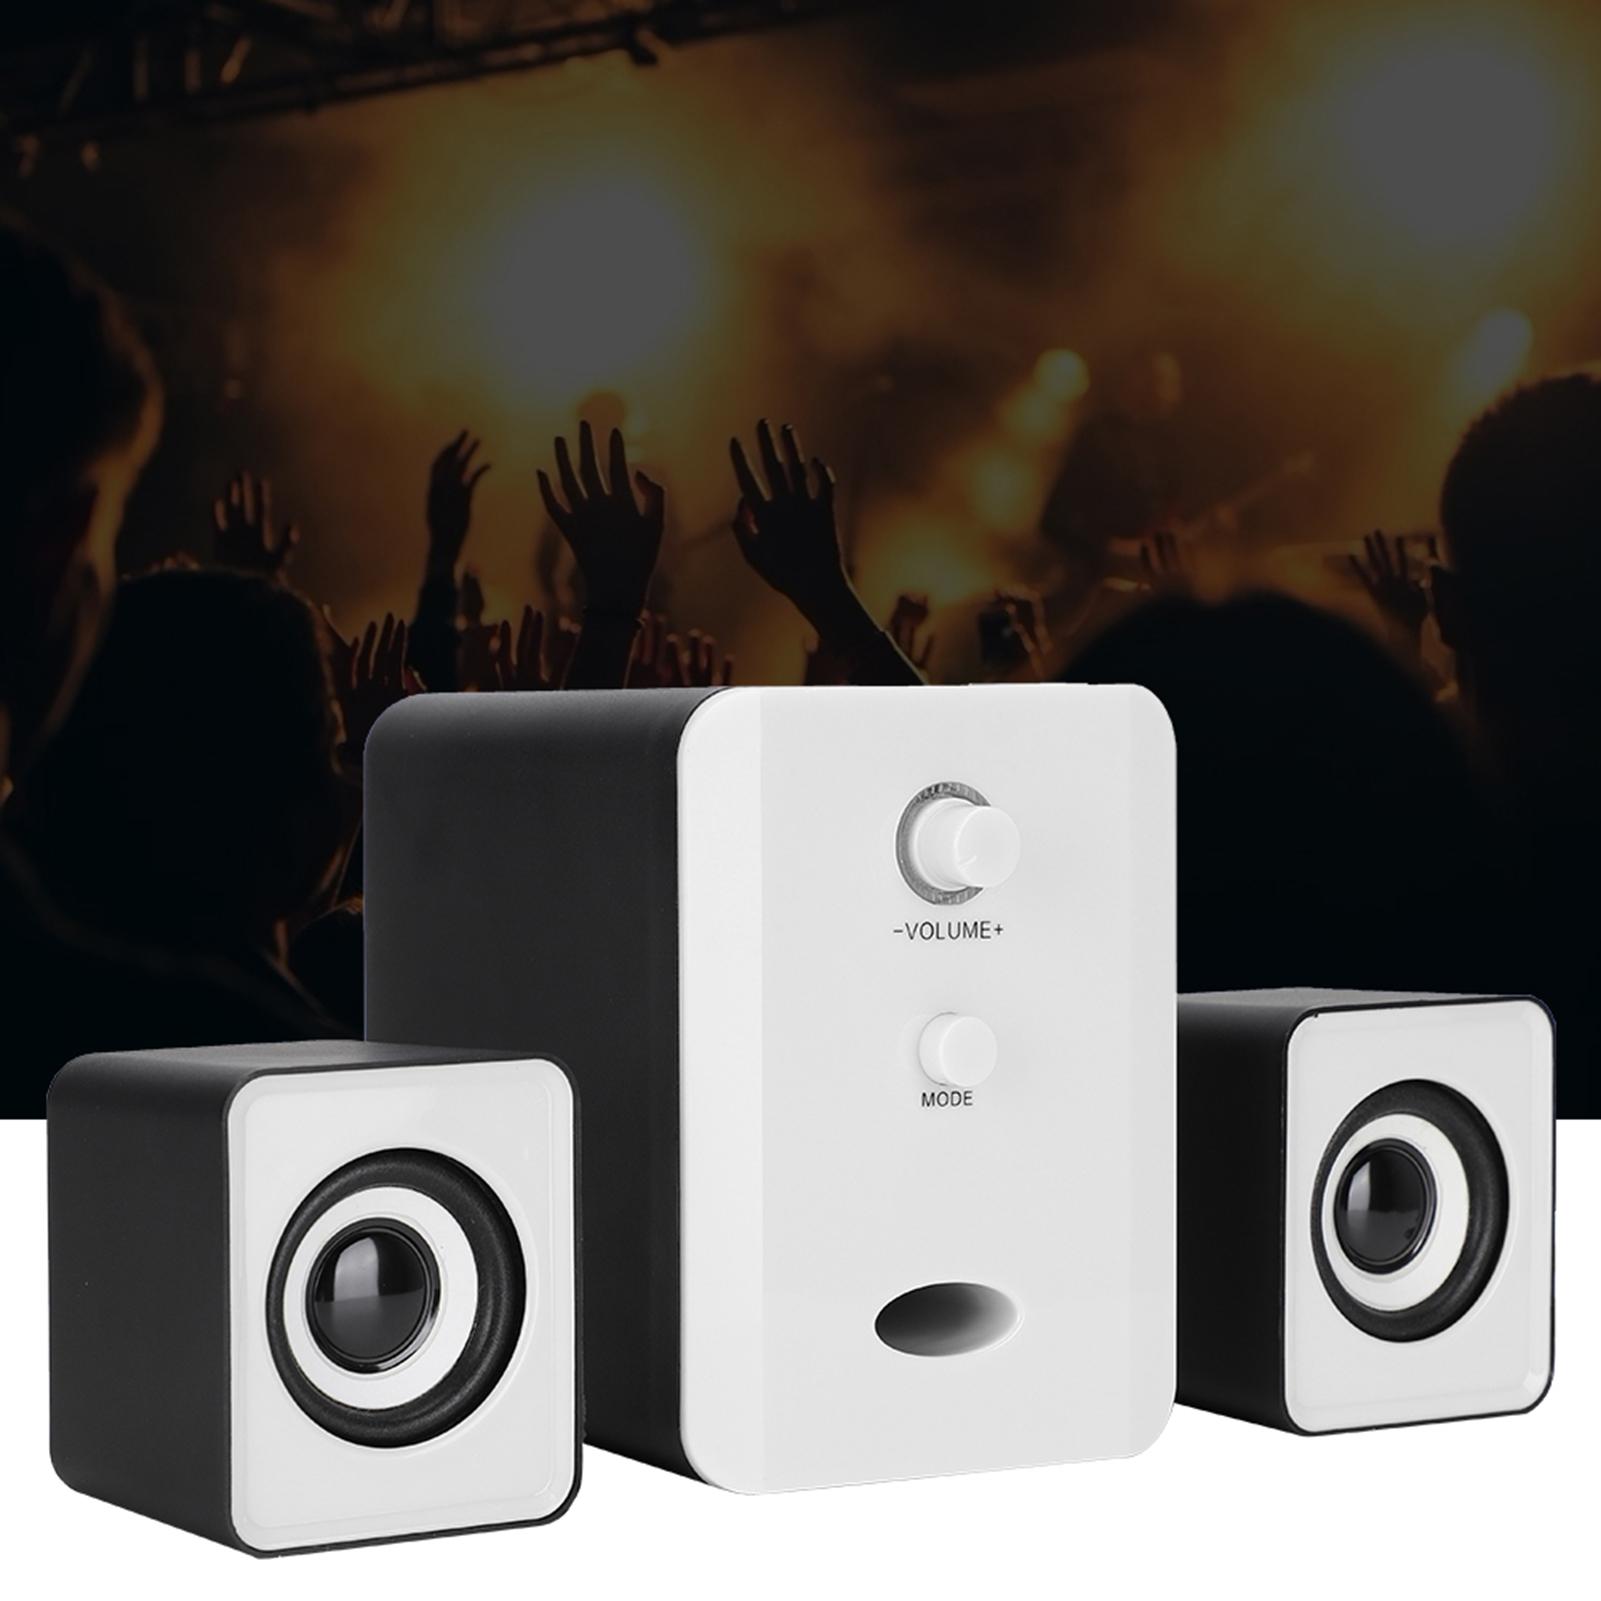 SADA-Bluetooth-Computer-Speaker-Desktop-Laptop-PC-Stereo-Subwoofer-Multimedia thumbnail 89